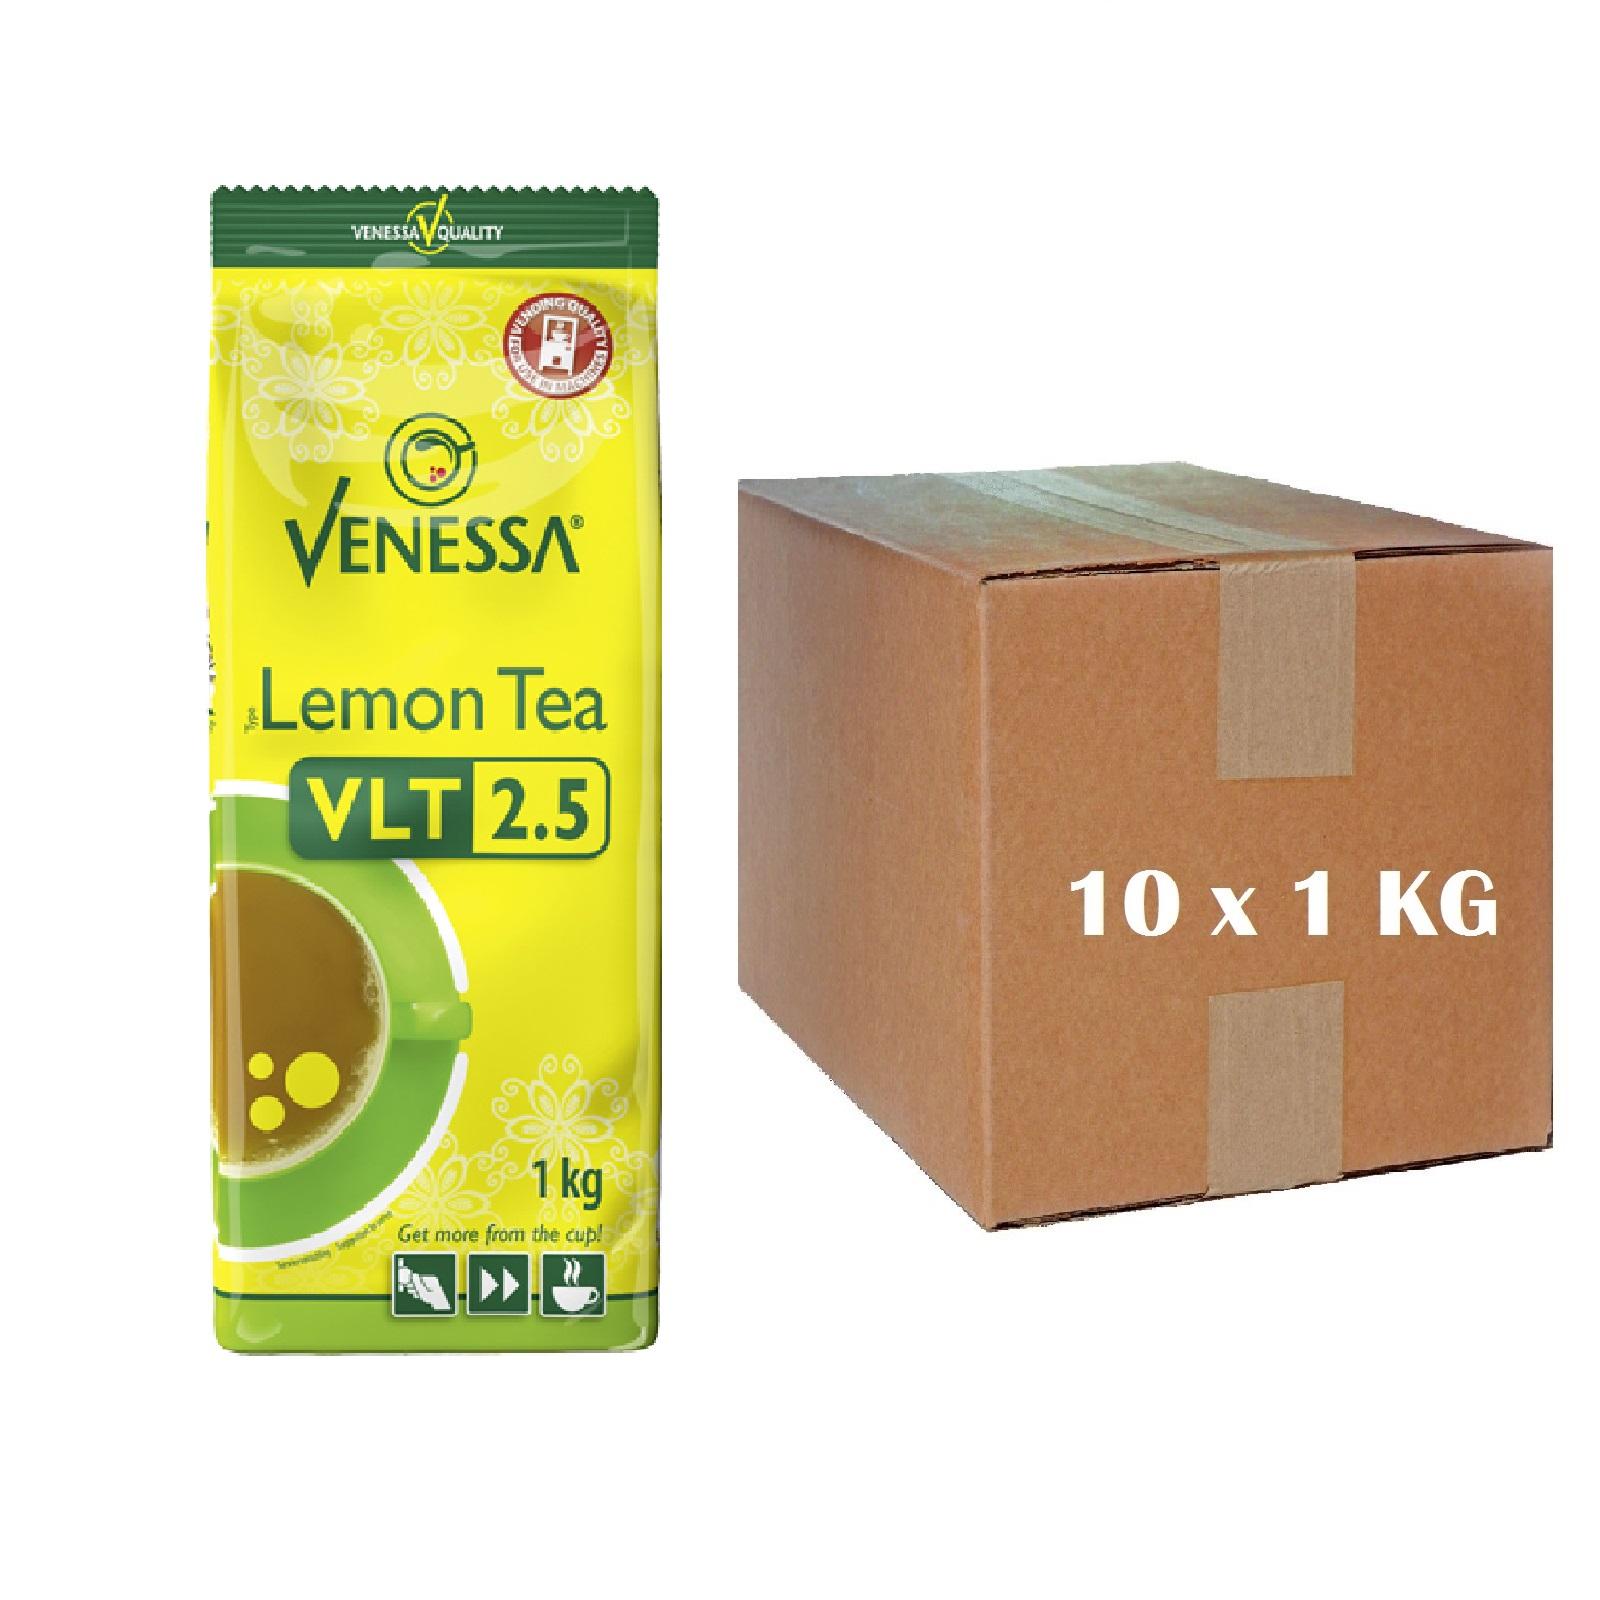 Venessa Lemon Teegetränk 10 x 1kg Automatentee Tee Instant